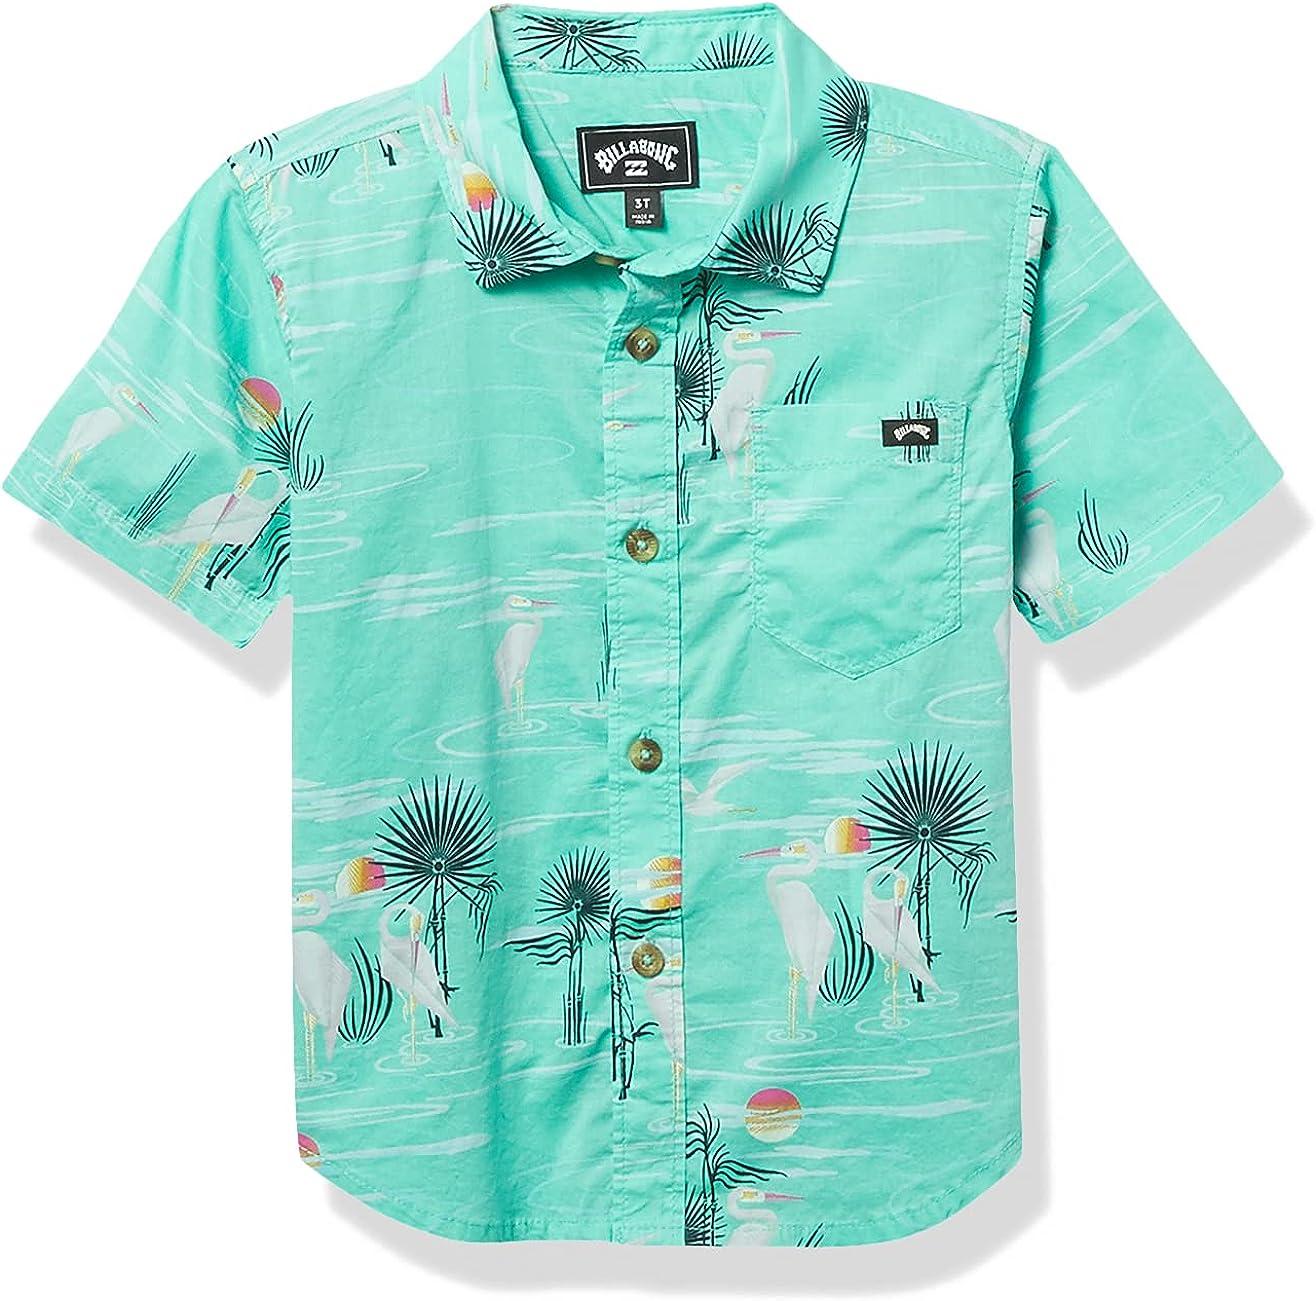 Billabong Boys' Sundays Floral Short Sleeve Woven Shirt